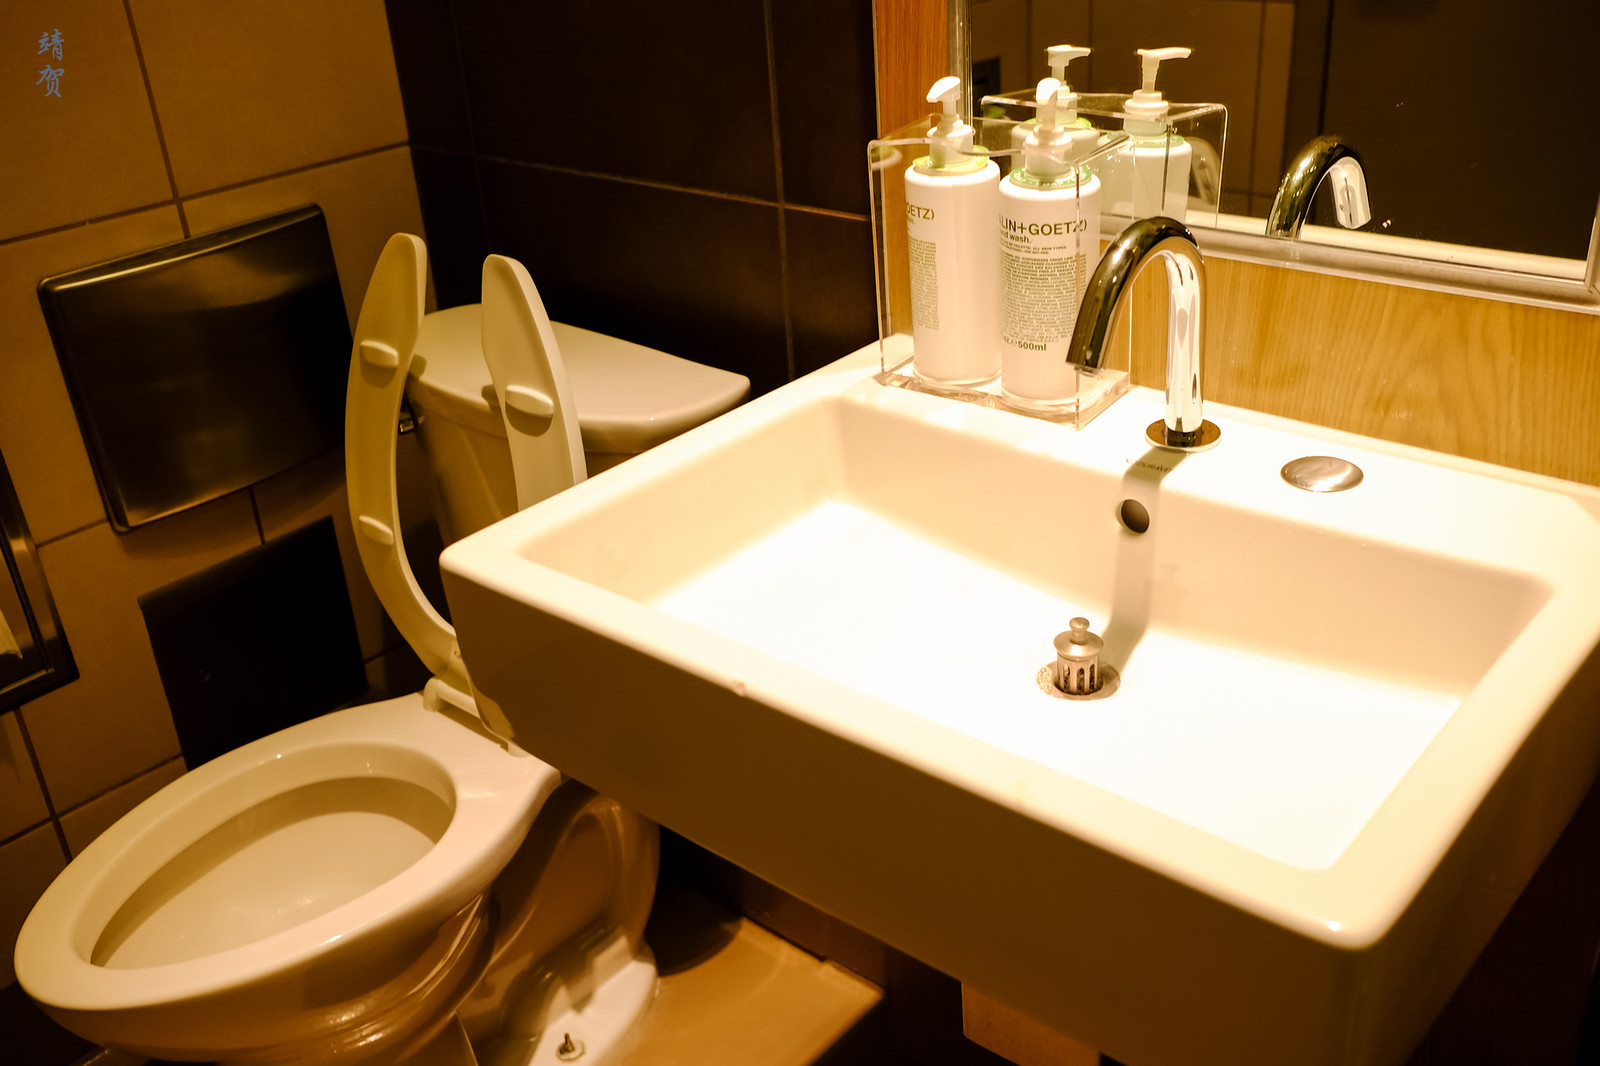 Toilet and washbasin